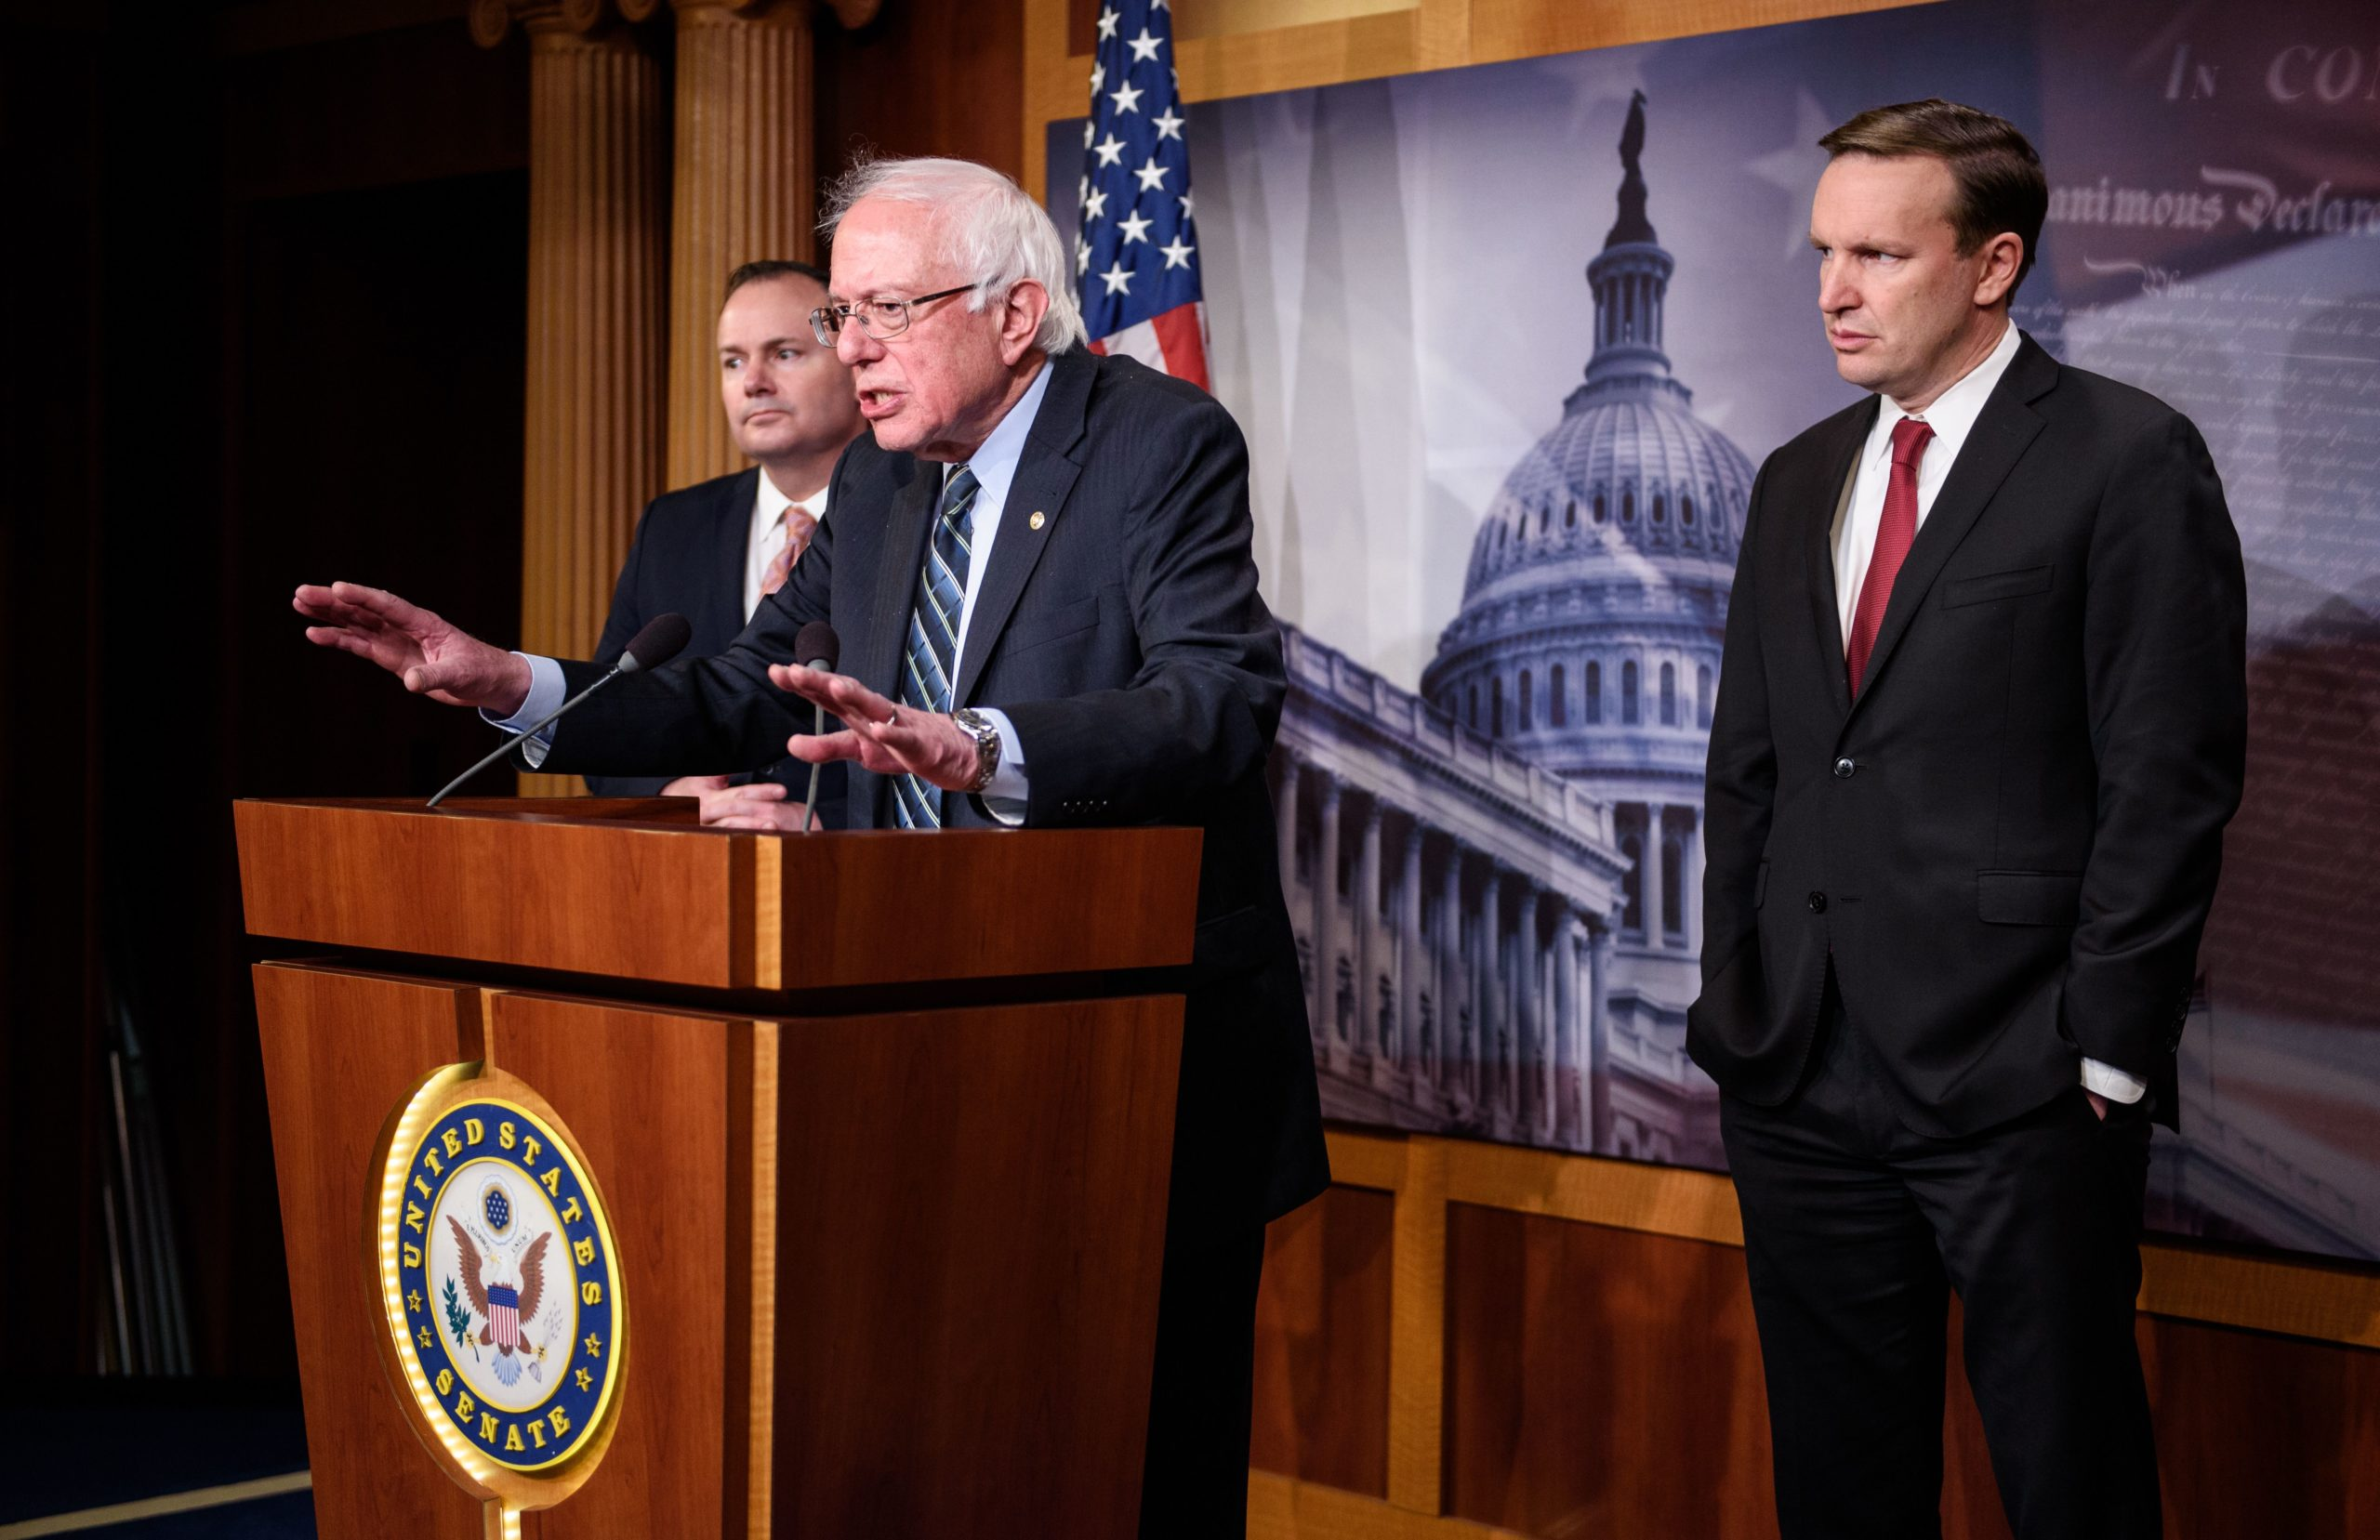 Sens. Bernie Sanders, Mike Lee and Chris Murphy speak after the Senate voted to withdraw support for Saudi Arabia's war in Yemen in December 2018. (MANDEL NGAN/AFP via Getty Images)